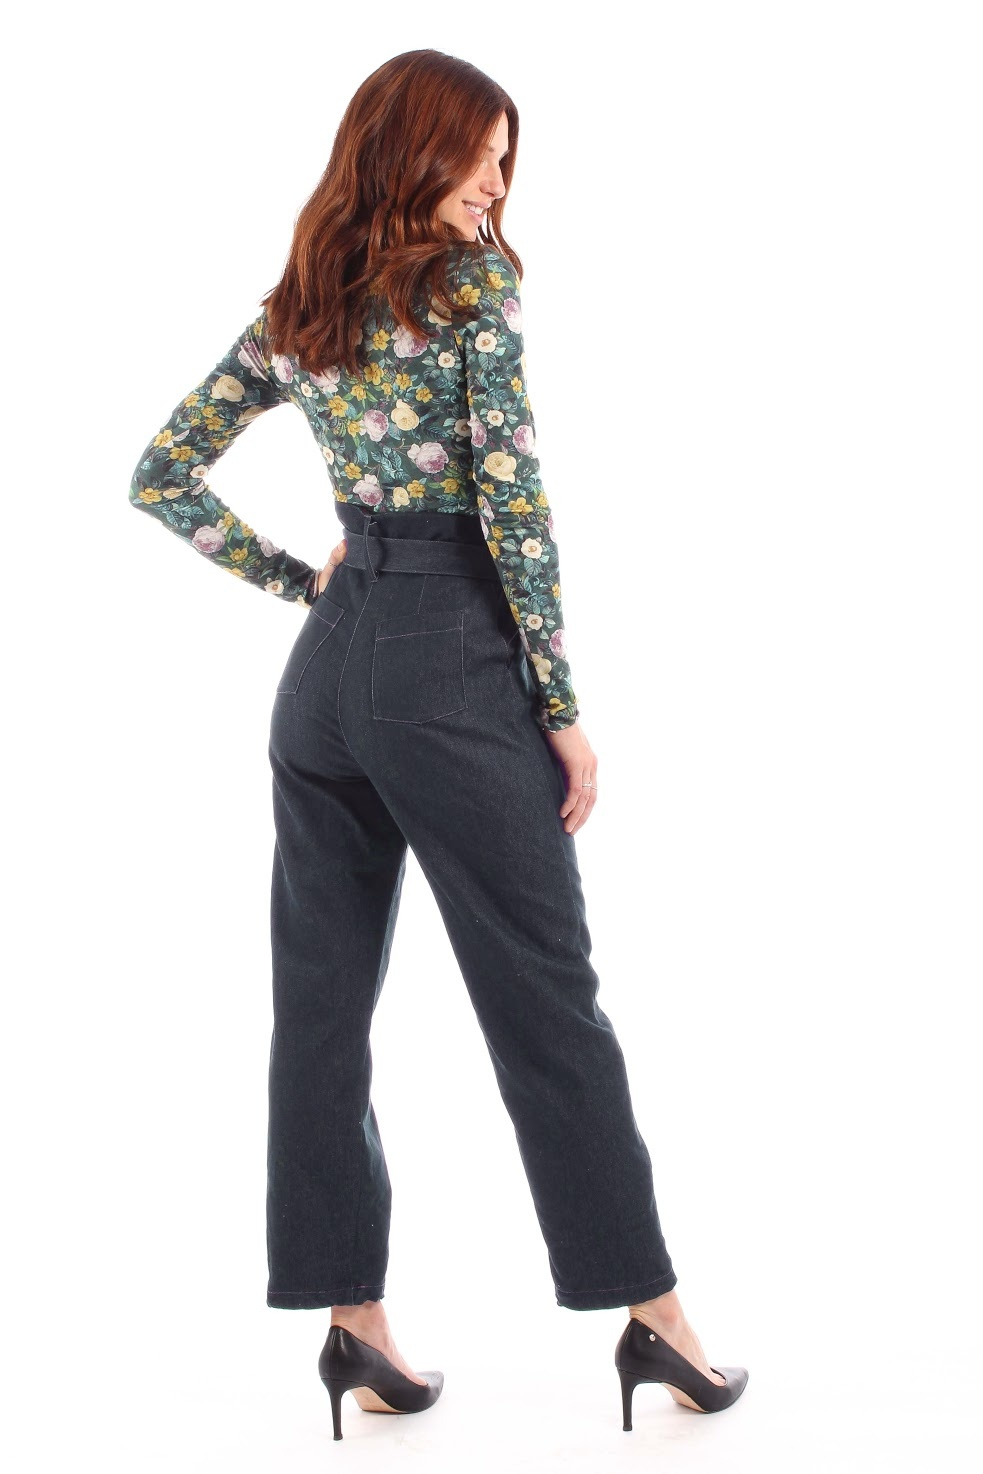 LDP LDP base pants denim adjustable